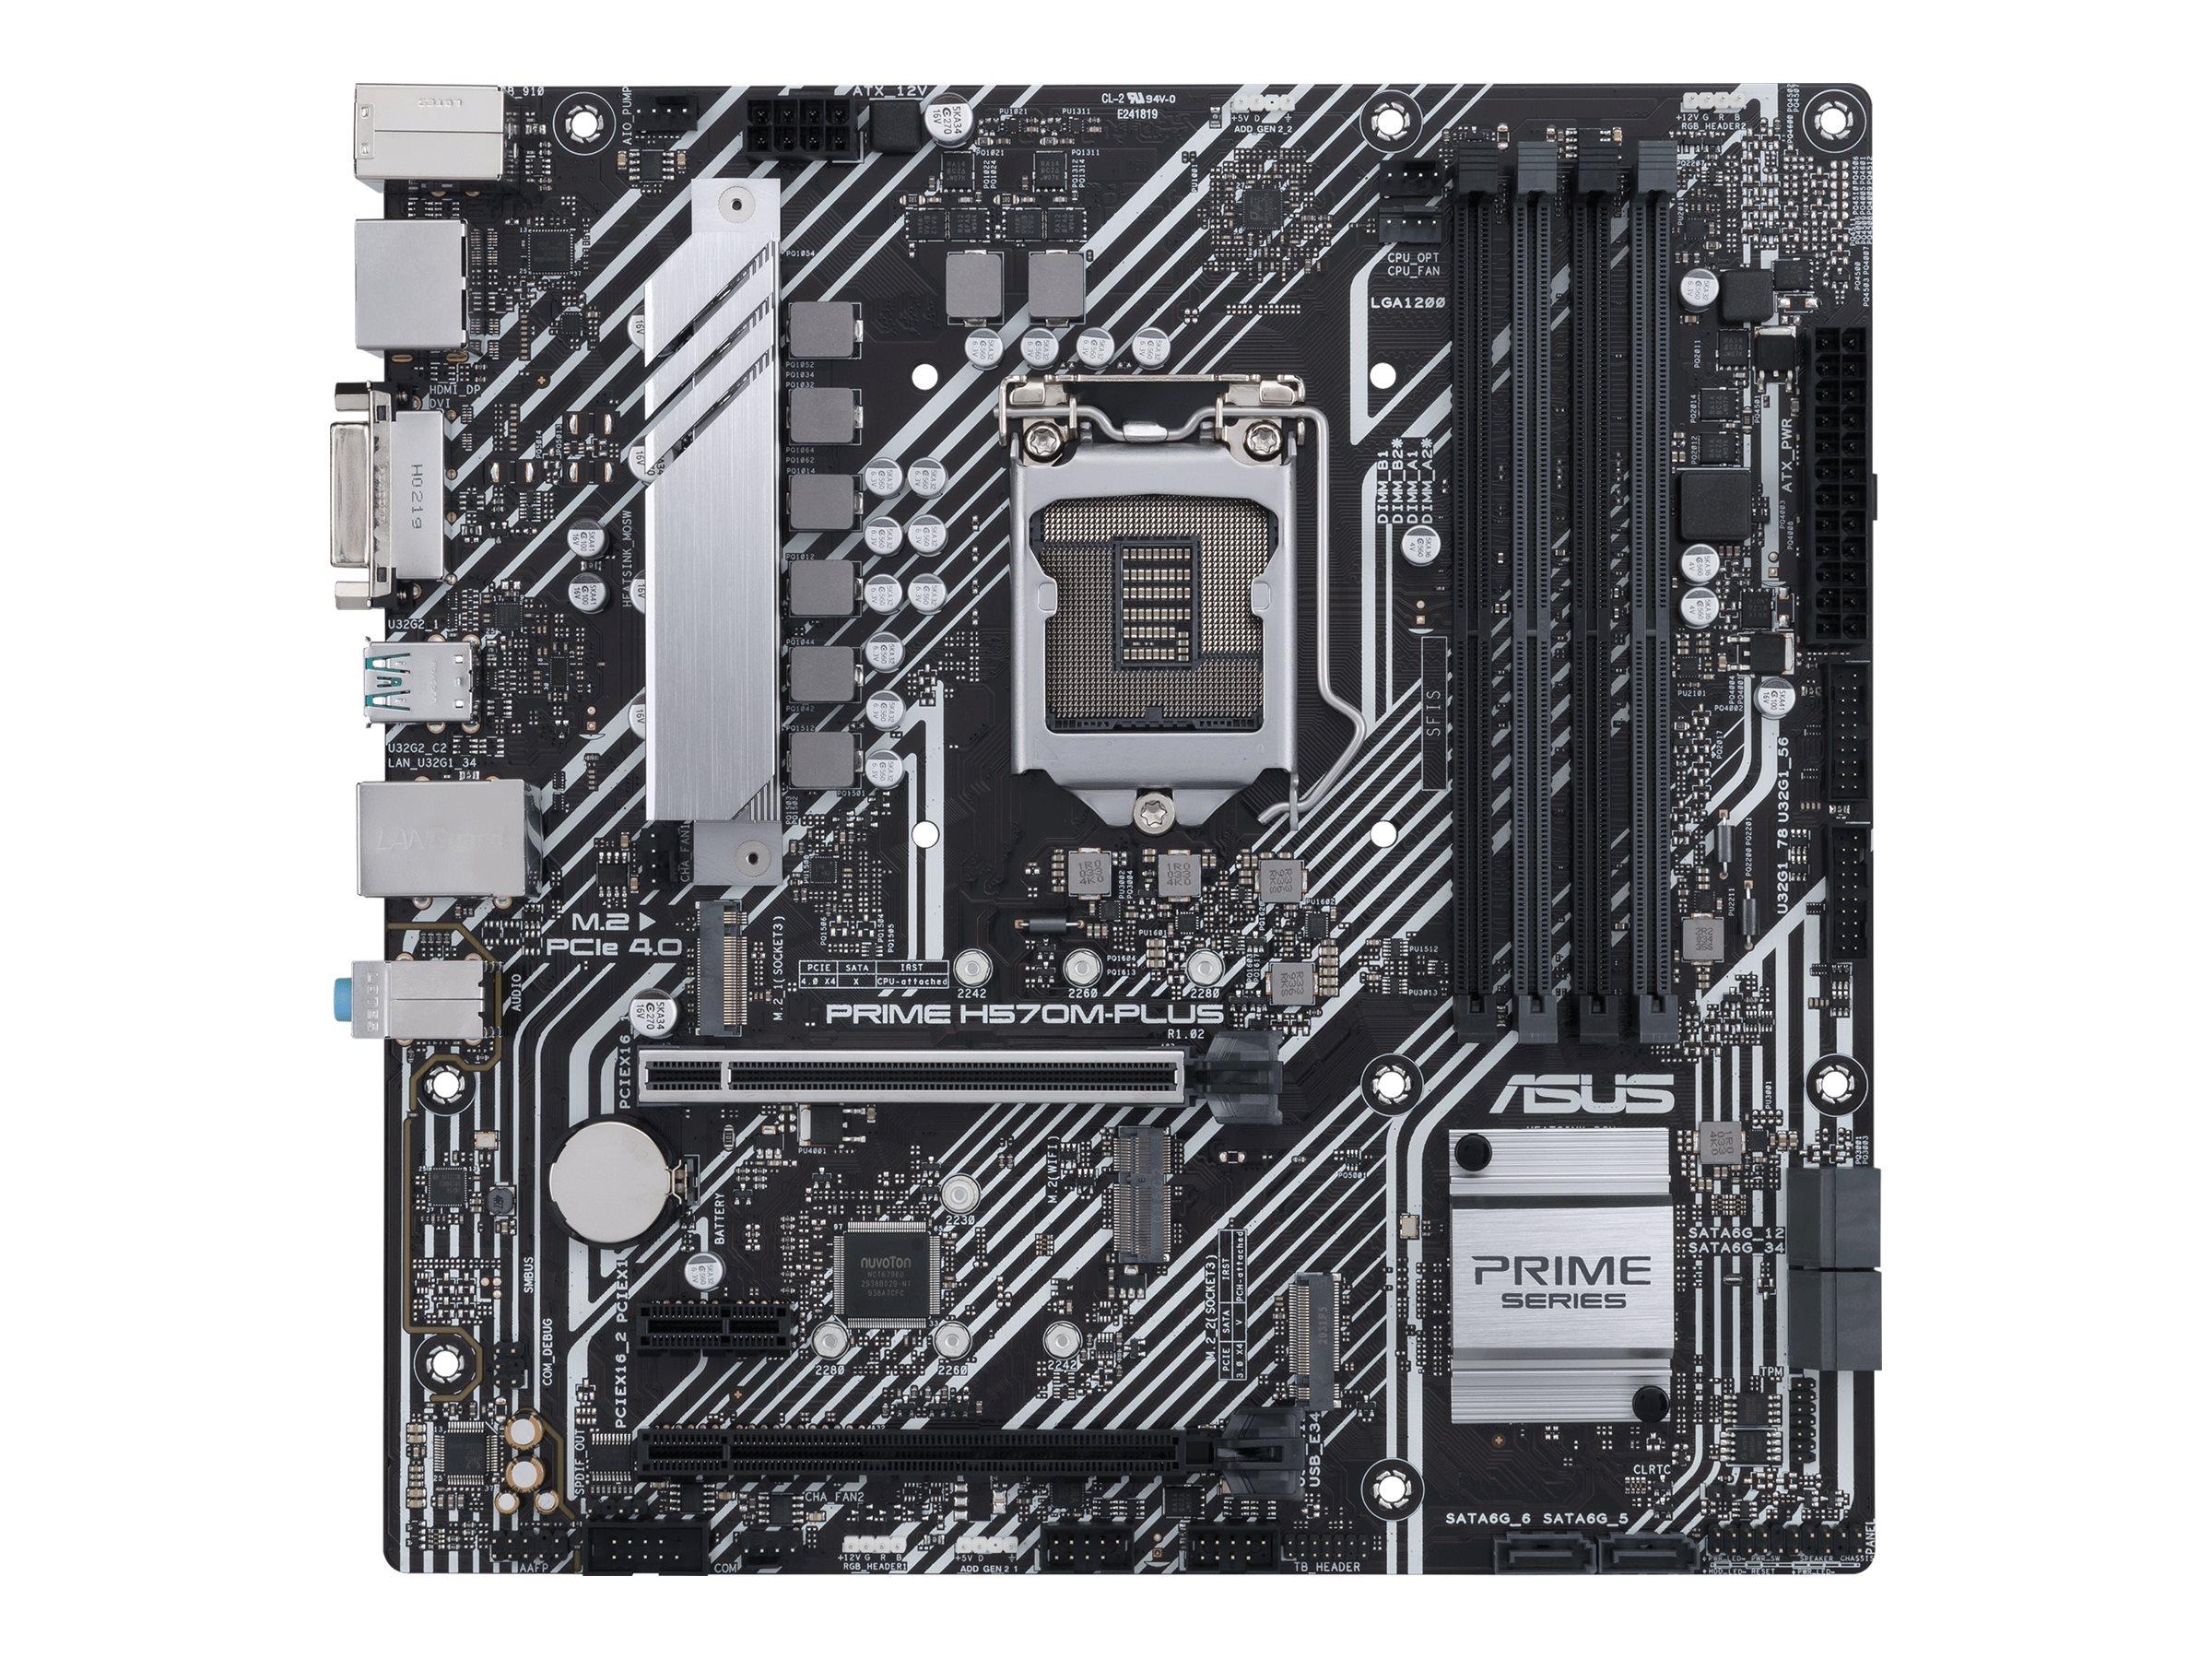 Vorschau: ASUS PRIME H570M-PLUS - Motherboard - micro ATX - LGA1200-Sockel - H570 - USB-C Gen2, USB 3.2 Gen 1, USB 3.2 Gen 2 - Gigabit LAN - Onboard-Grafik (CPU erforderlich)